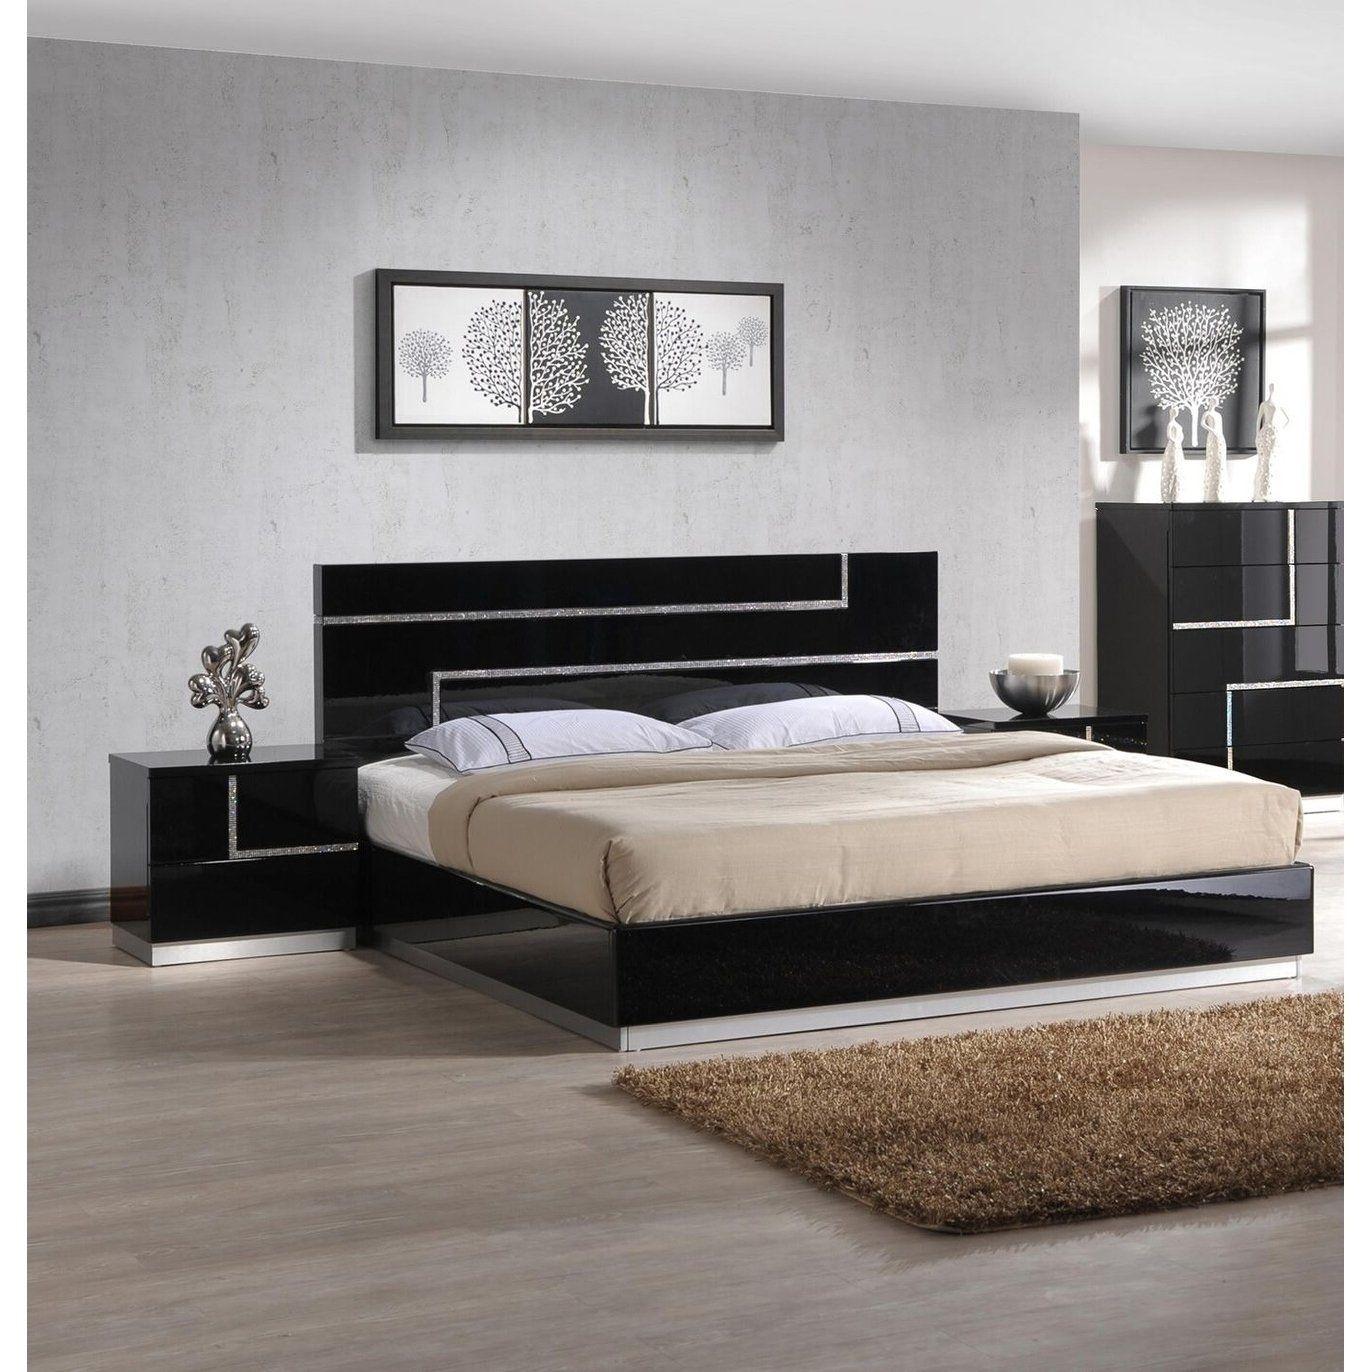 Black Bedroom Furniture Design Simple Bedroom Cheap Bedroom Furniture